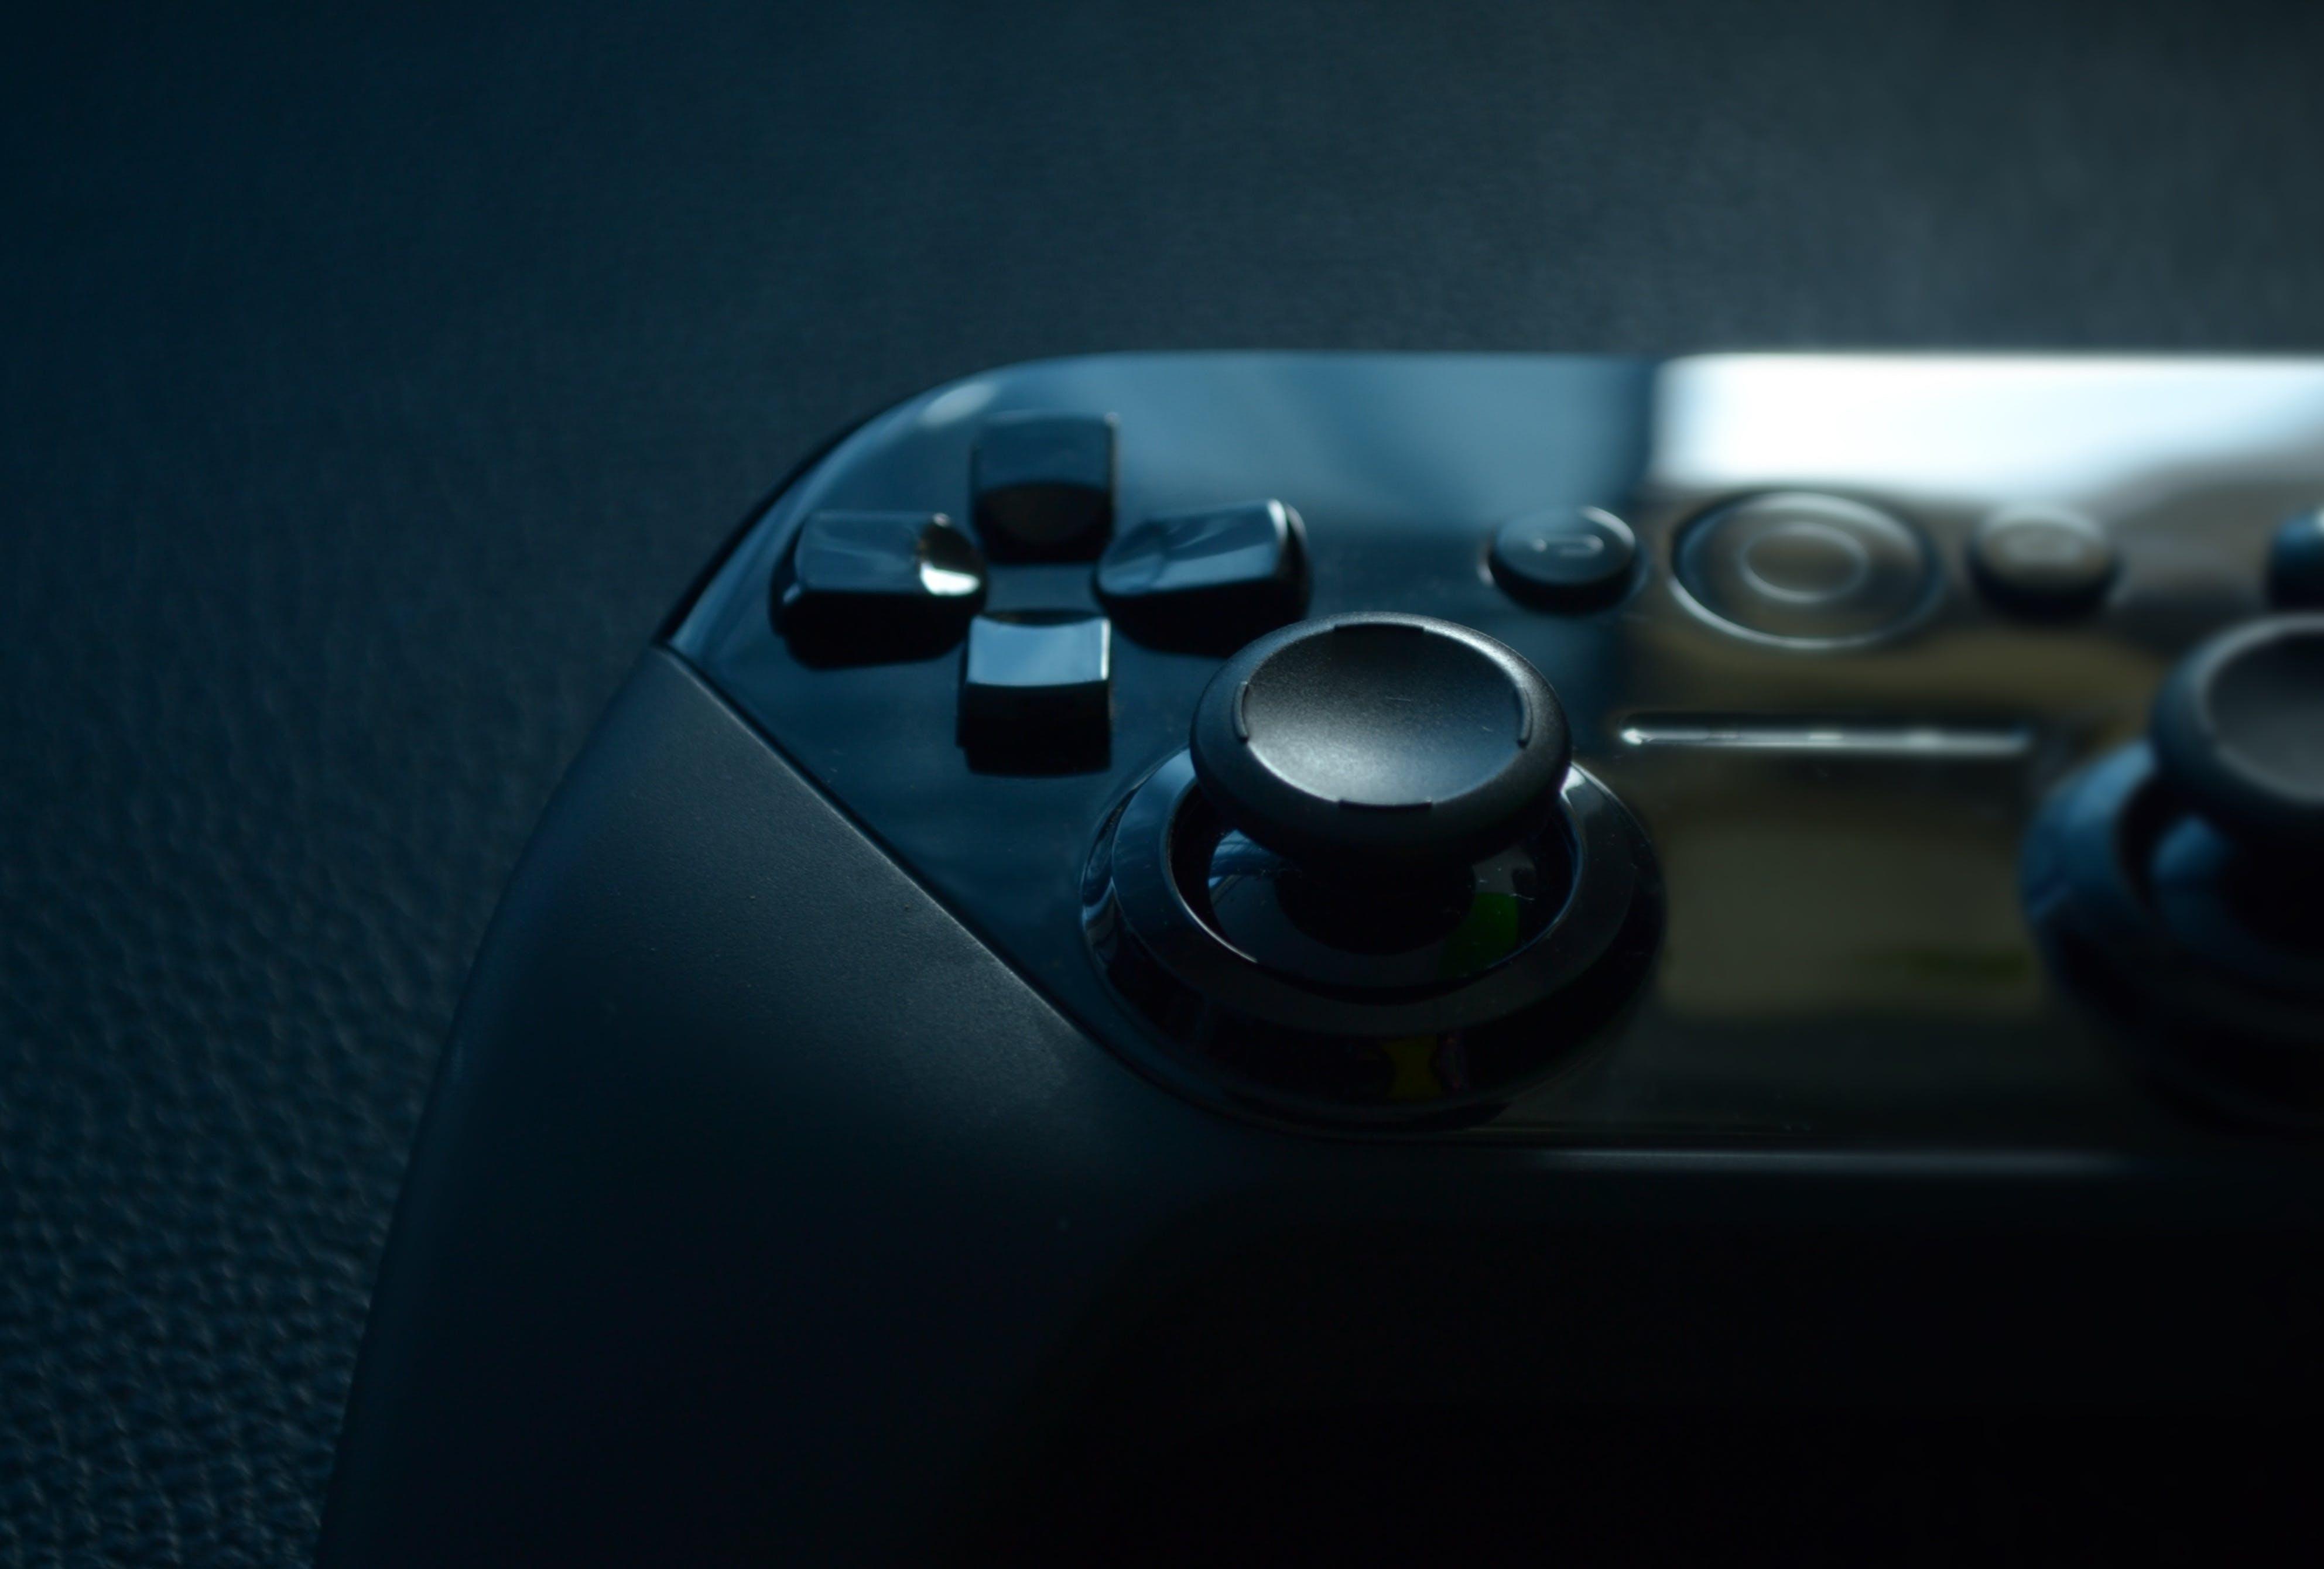 https://images.pexels.com/photos/159204/game-controller-joystick-joypad-gamepad-159204.jpeg?auto=compress&cs=tinysrgb&dpr=2&h=650&w=940